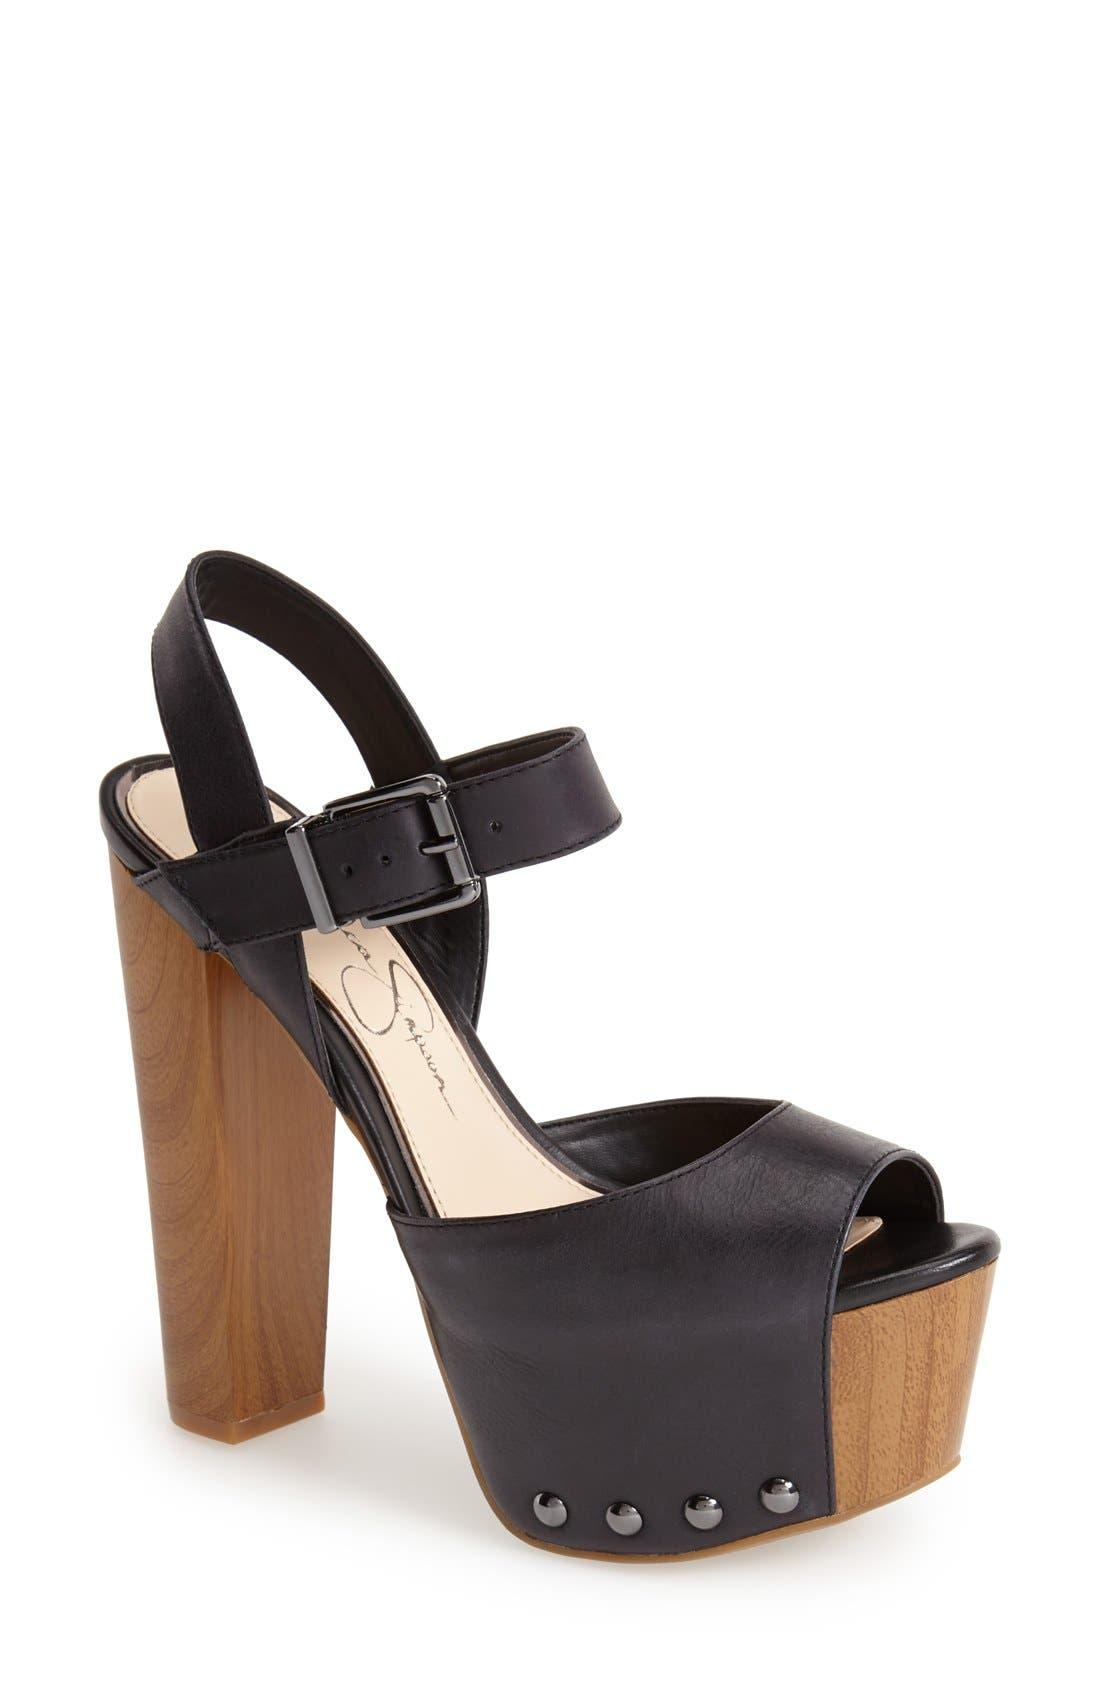 Alternate Image 1 Selected - Jessica Simpson 'Daelyn' Studded Leather Platform Sandal (Women)